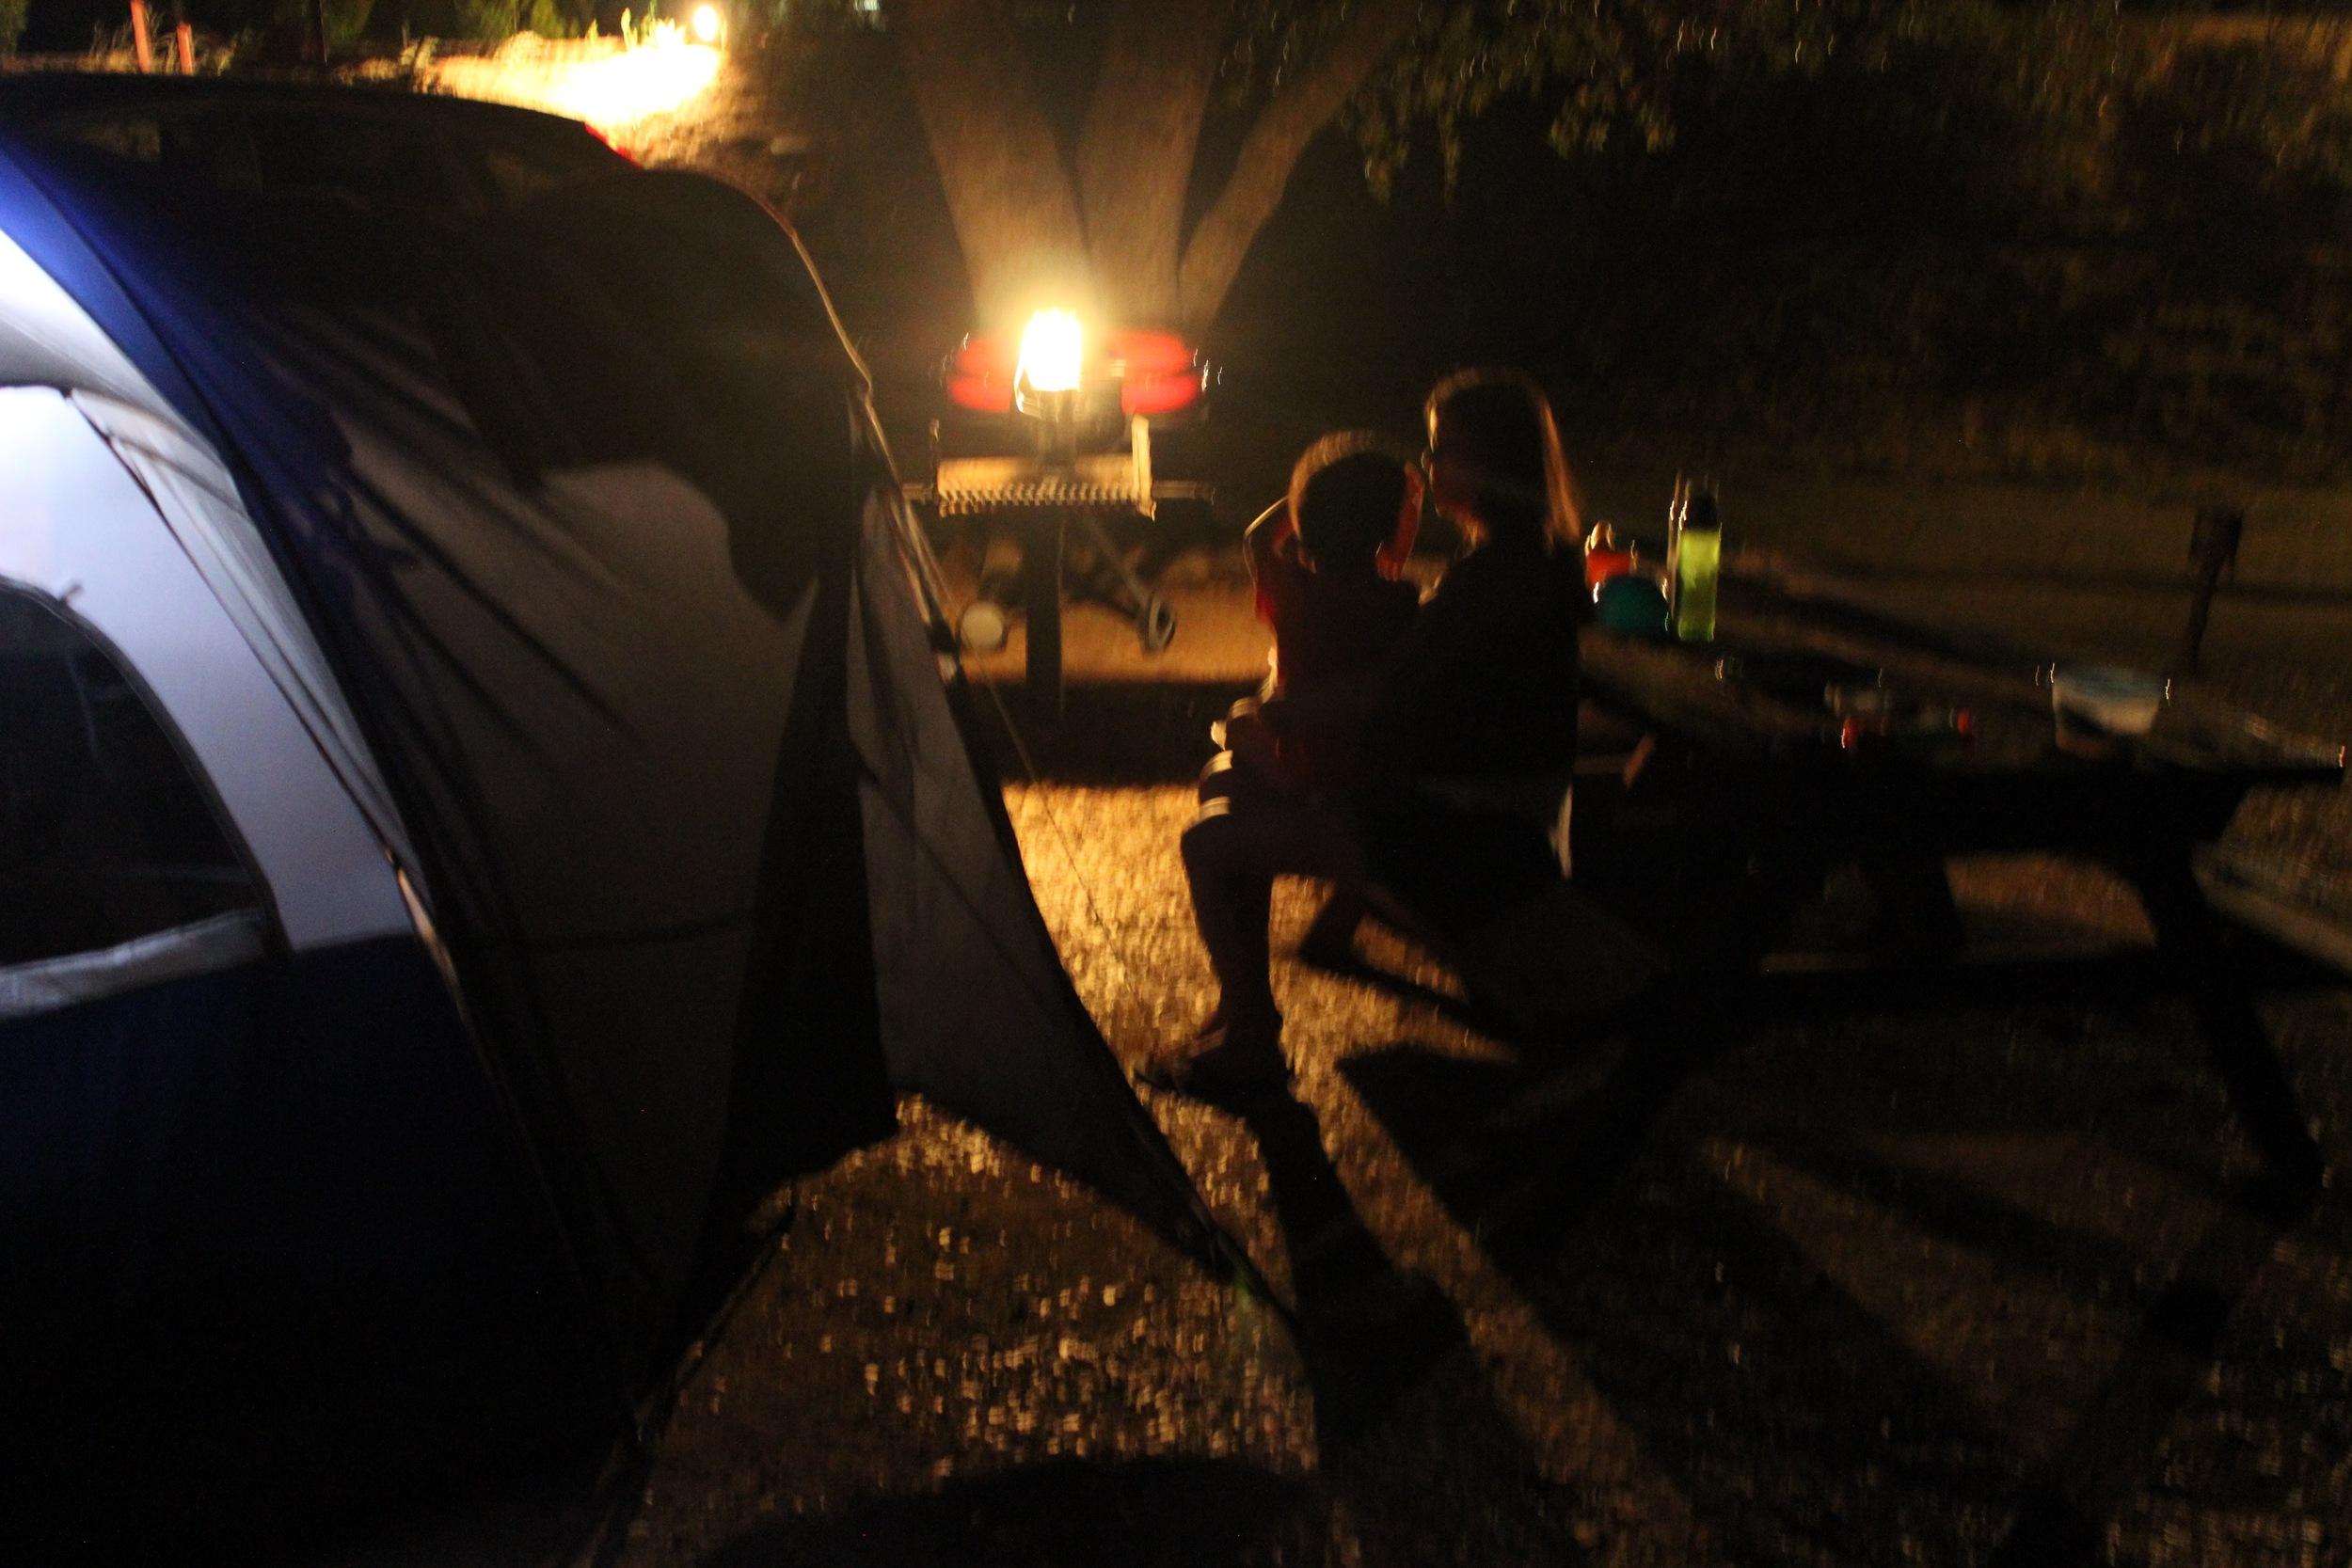 Coarsegold_Ca_KOA_Camping August_2015210.jpg